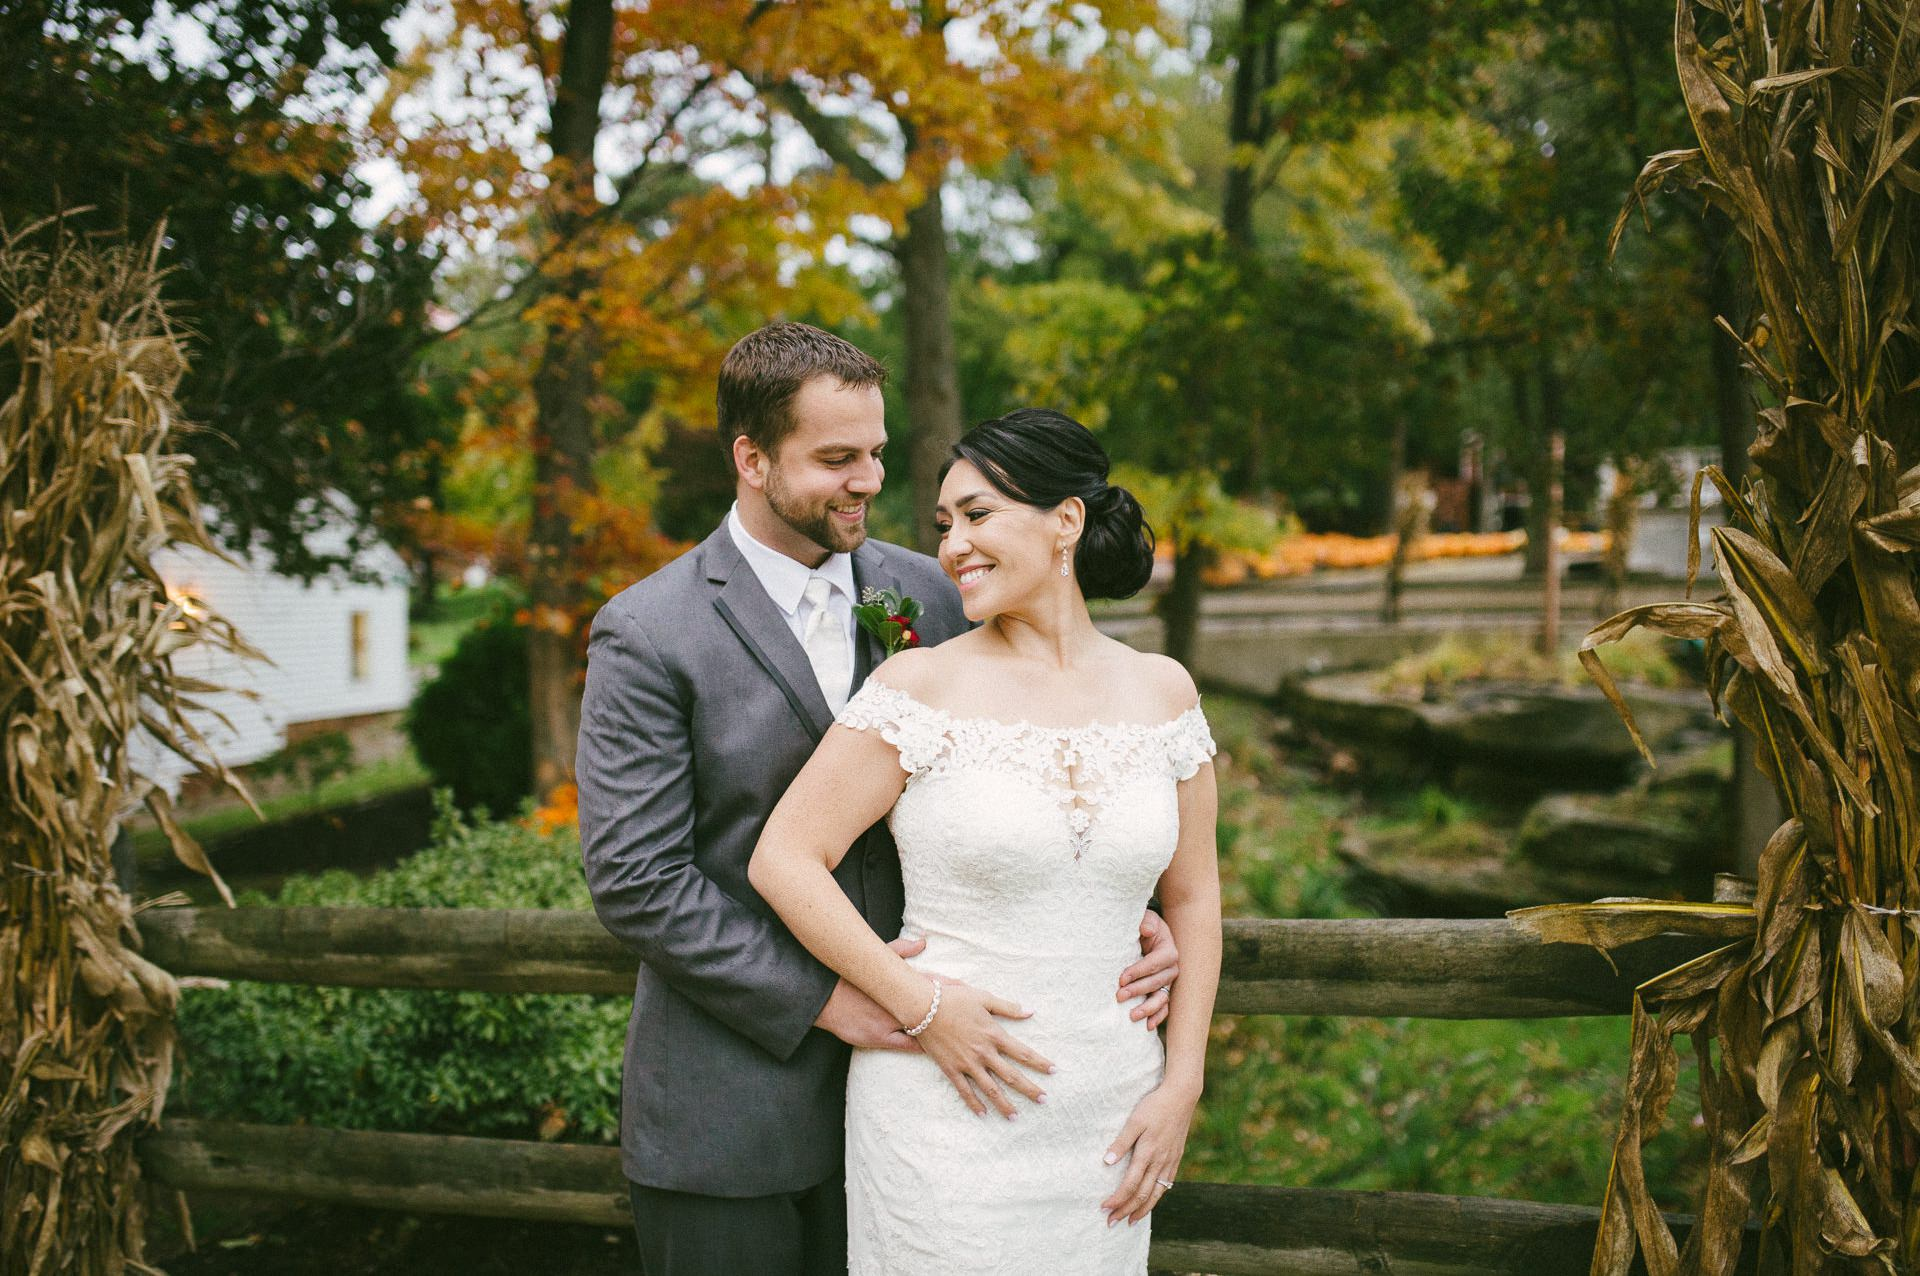 Patterson Fruit Farm Wedding Photographer in Cleveland 1 45.jpg